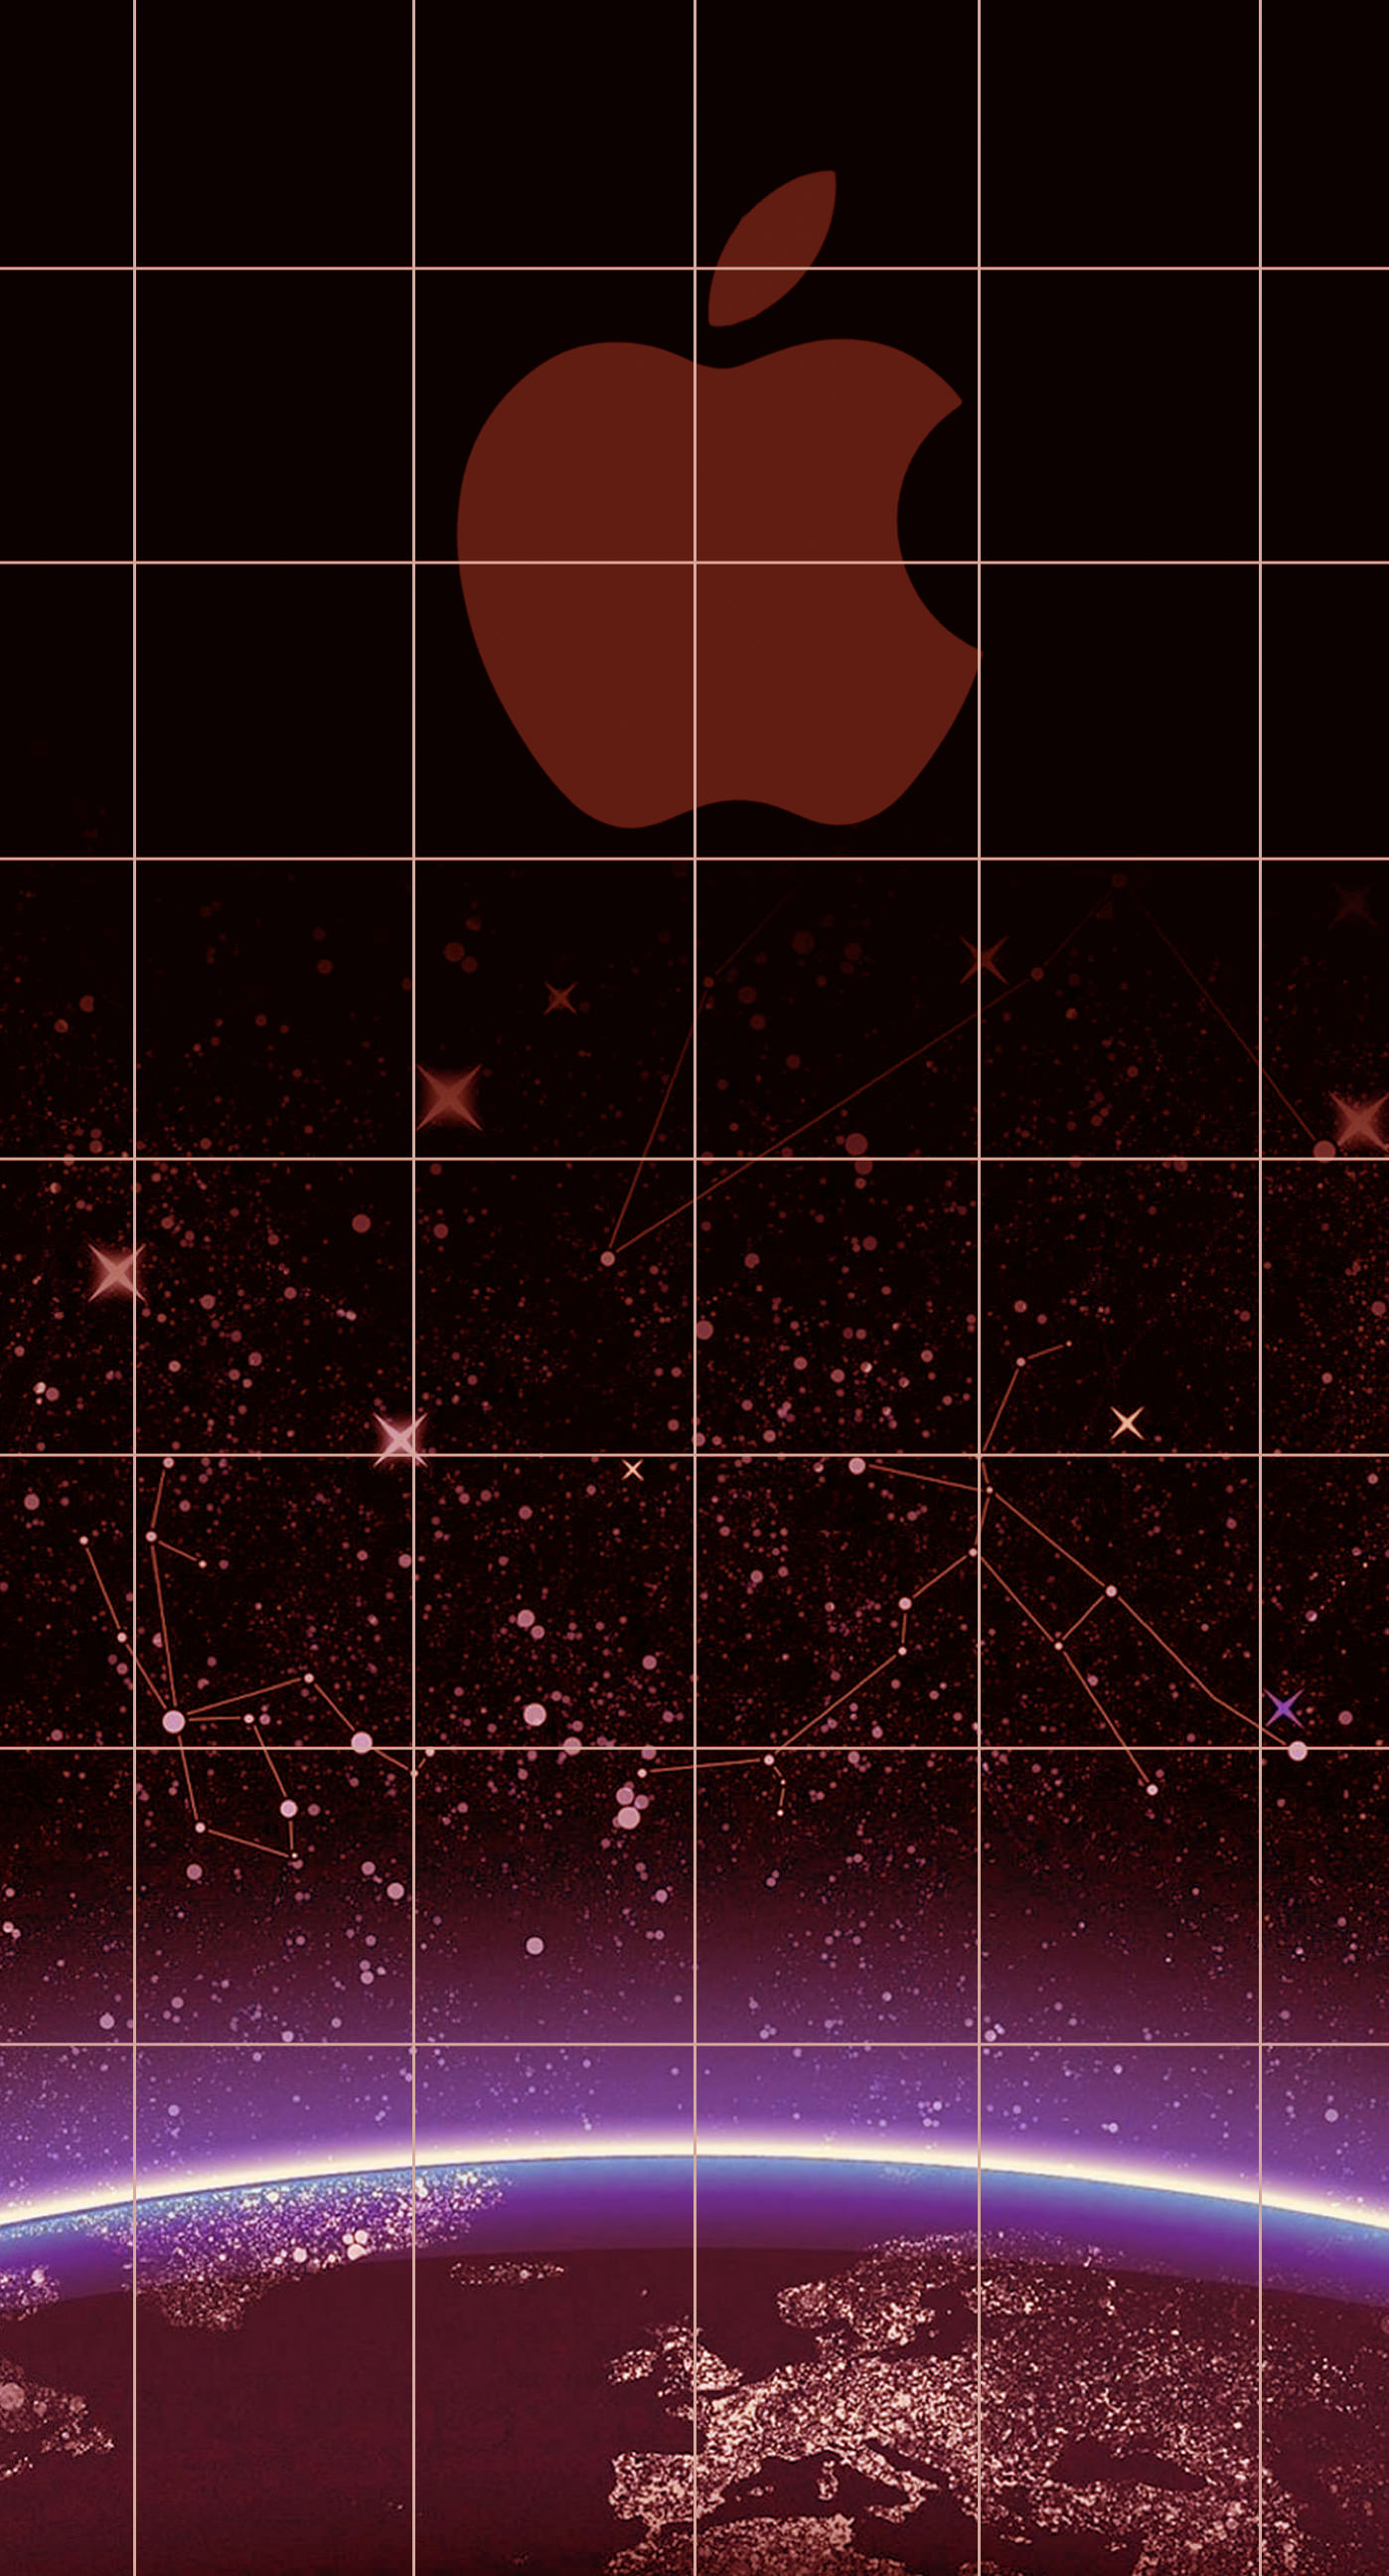 Apple logo shelf cool red universe wallpapersc iPhone7Plus 1398x2592